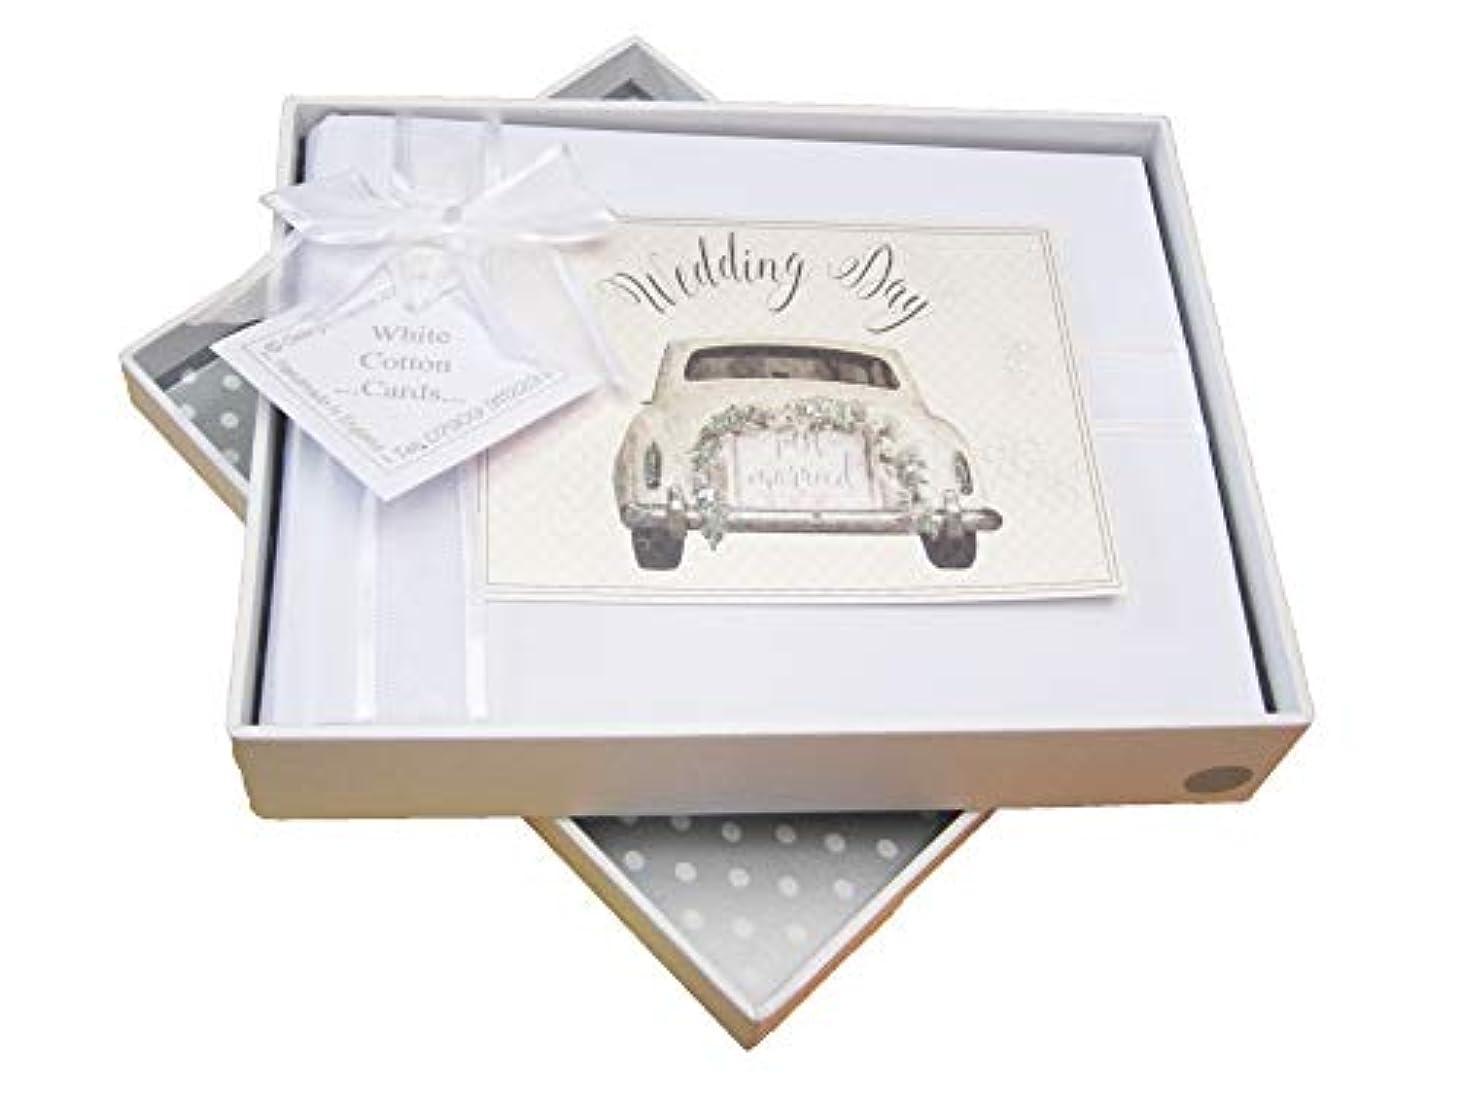 White Cotton Cards Wedding Day Photo Album, Wedding Car Design (NWC1S)